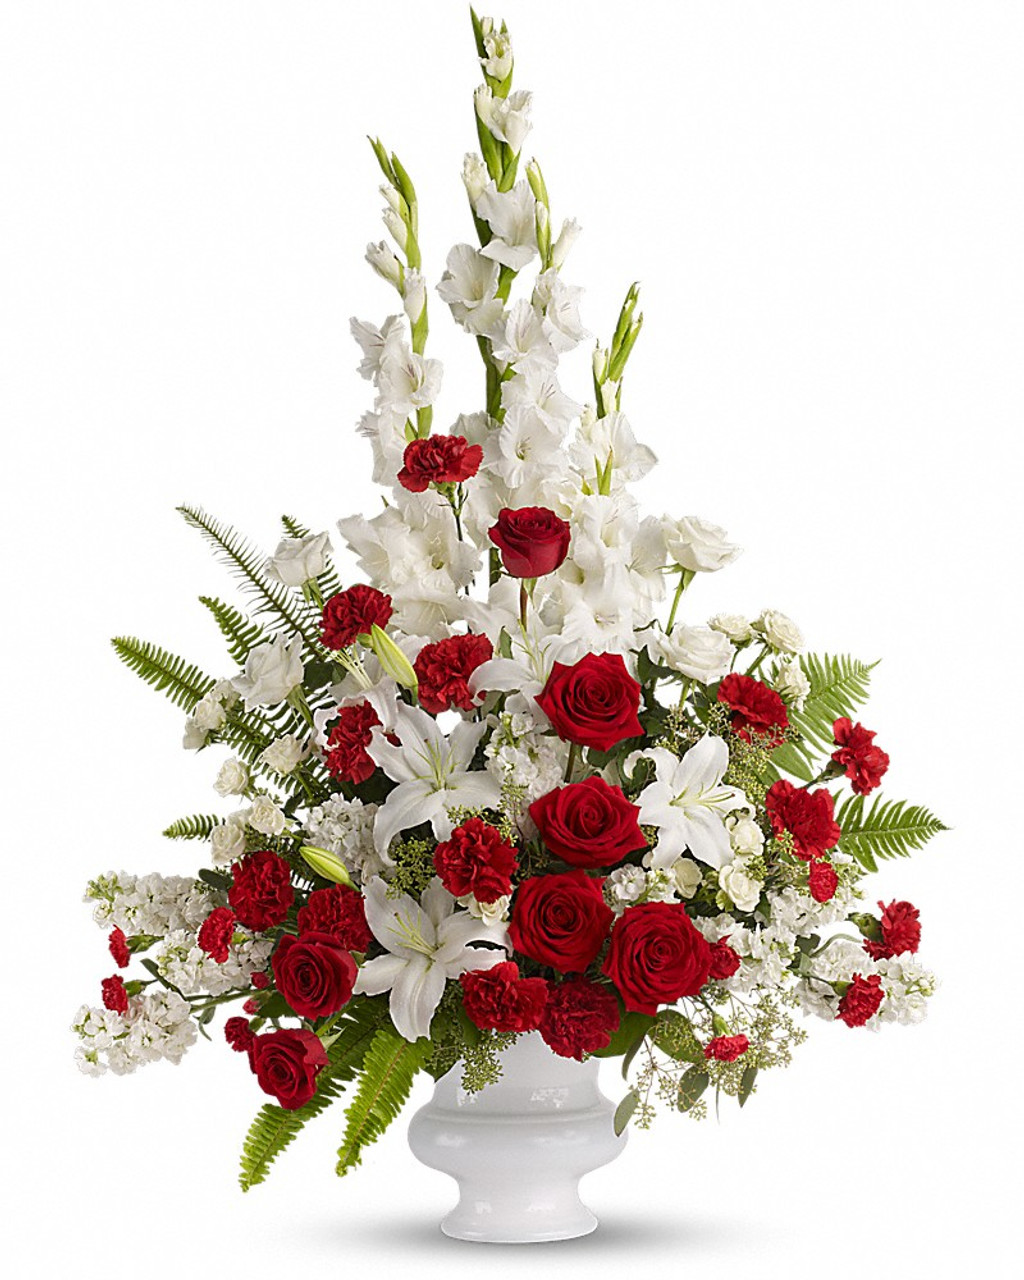 Red and white sympathy basket fnfsb 29 sympathy tributes red and white sympathy basket fnfsb 29 izmirmasajfo